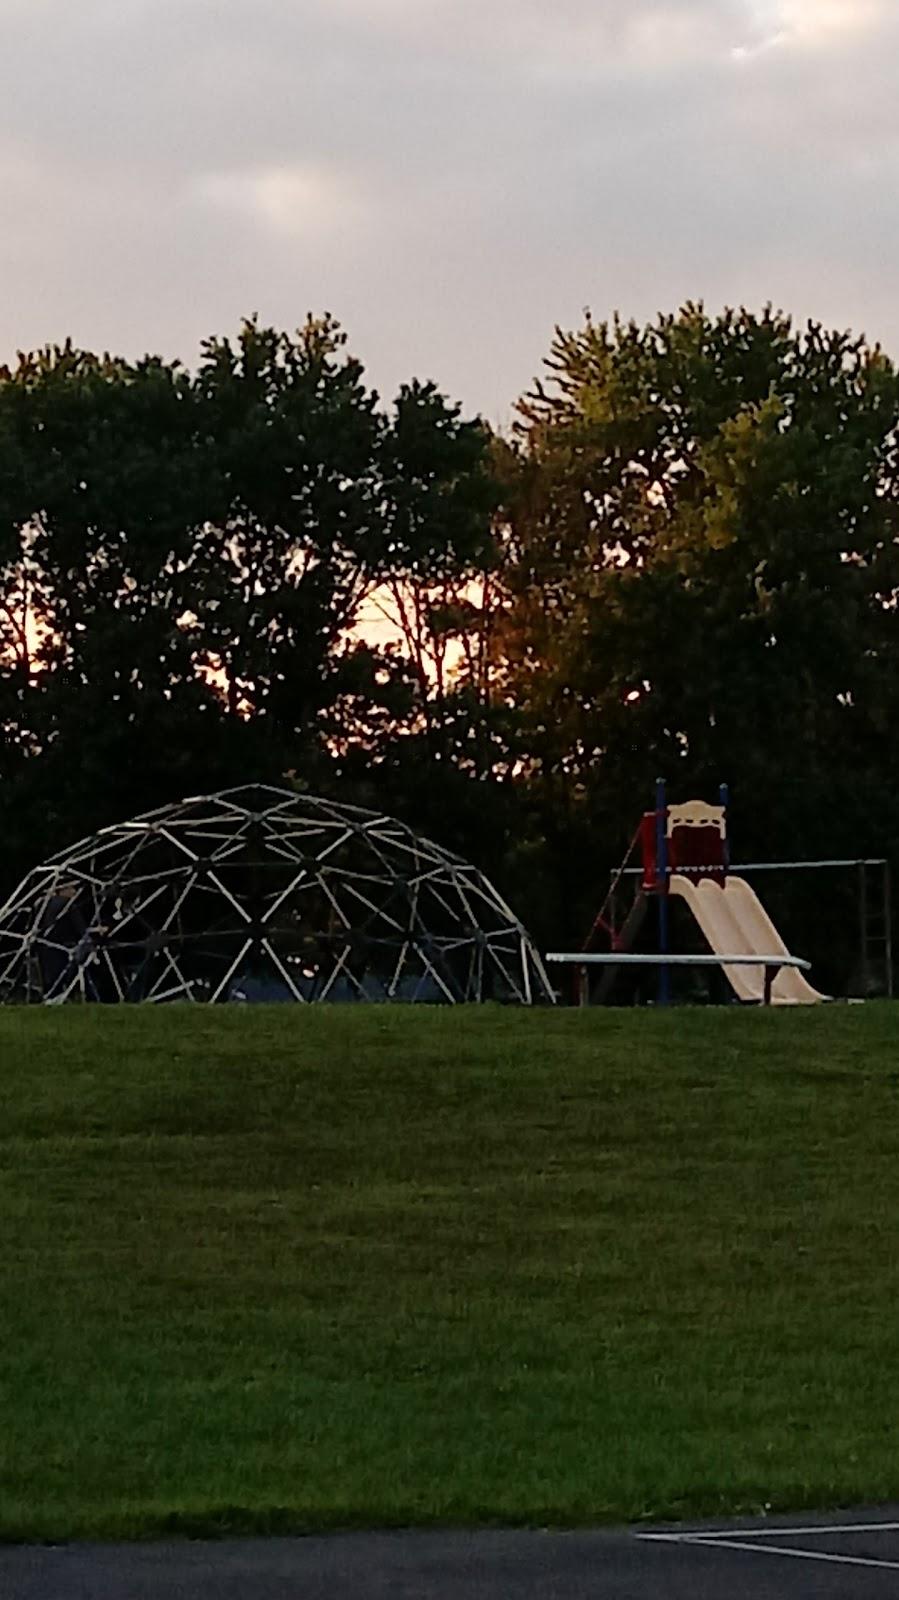 Summerside Elementary School - school    Photo 8 of 10   Address: 4639 Vermona Dr, Cincinnati, OH 45245, USA   Phone: (513) 947-7900